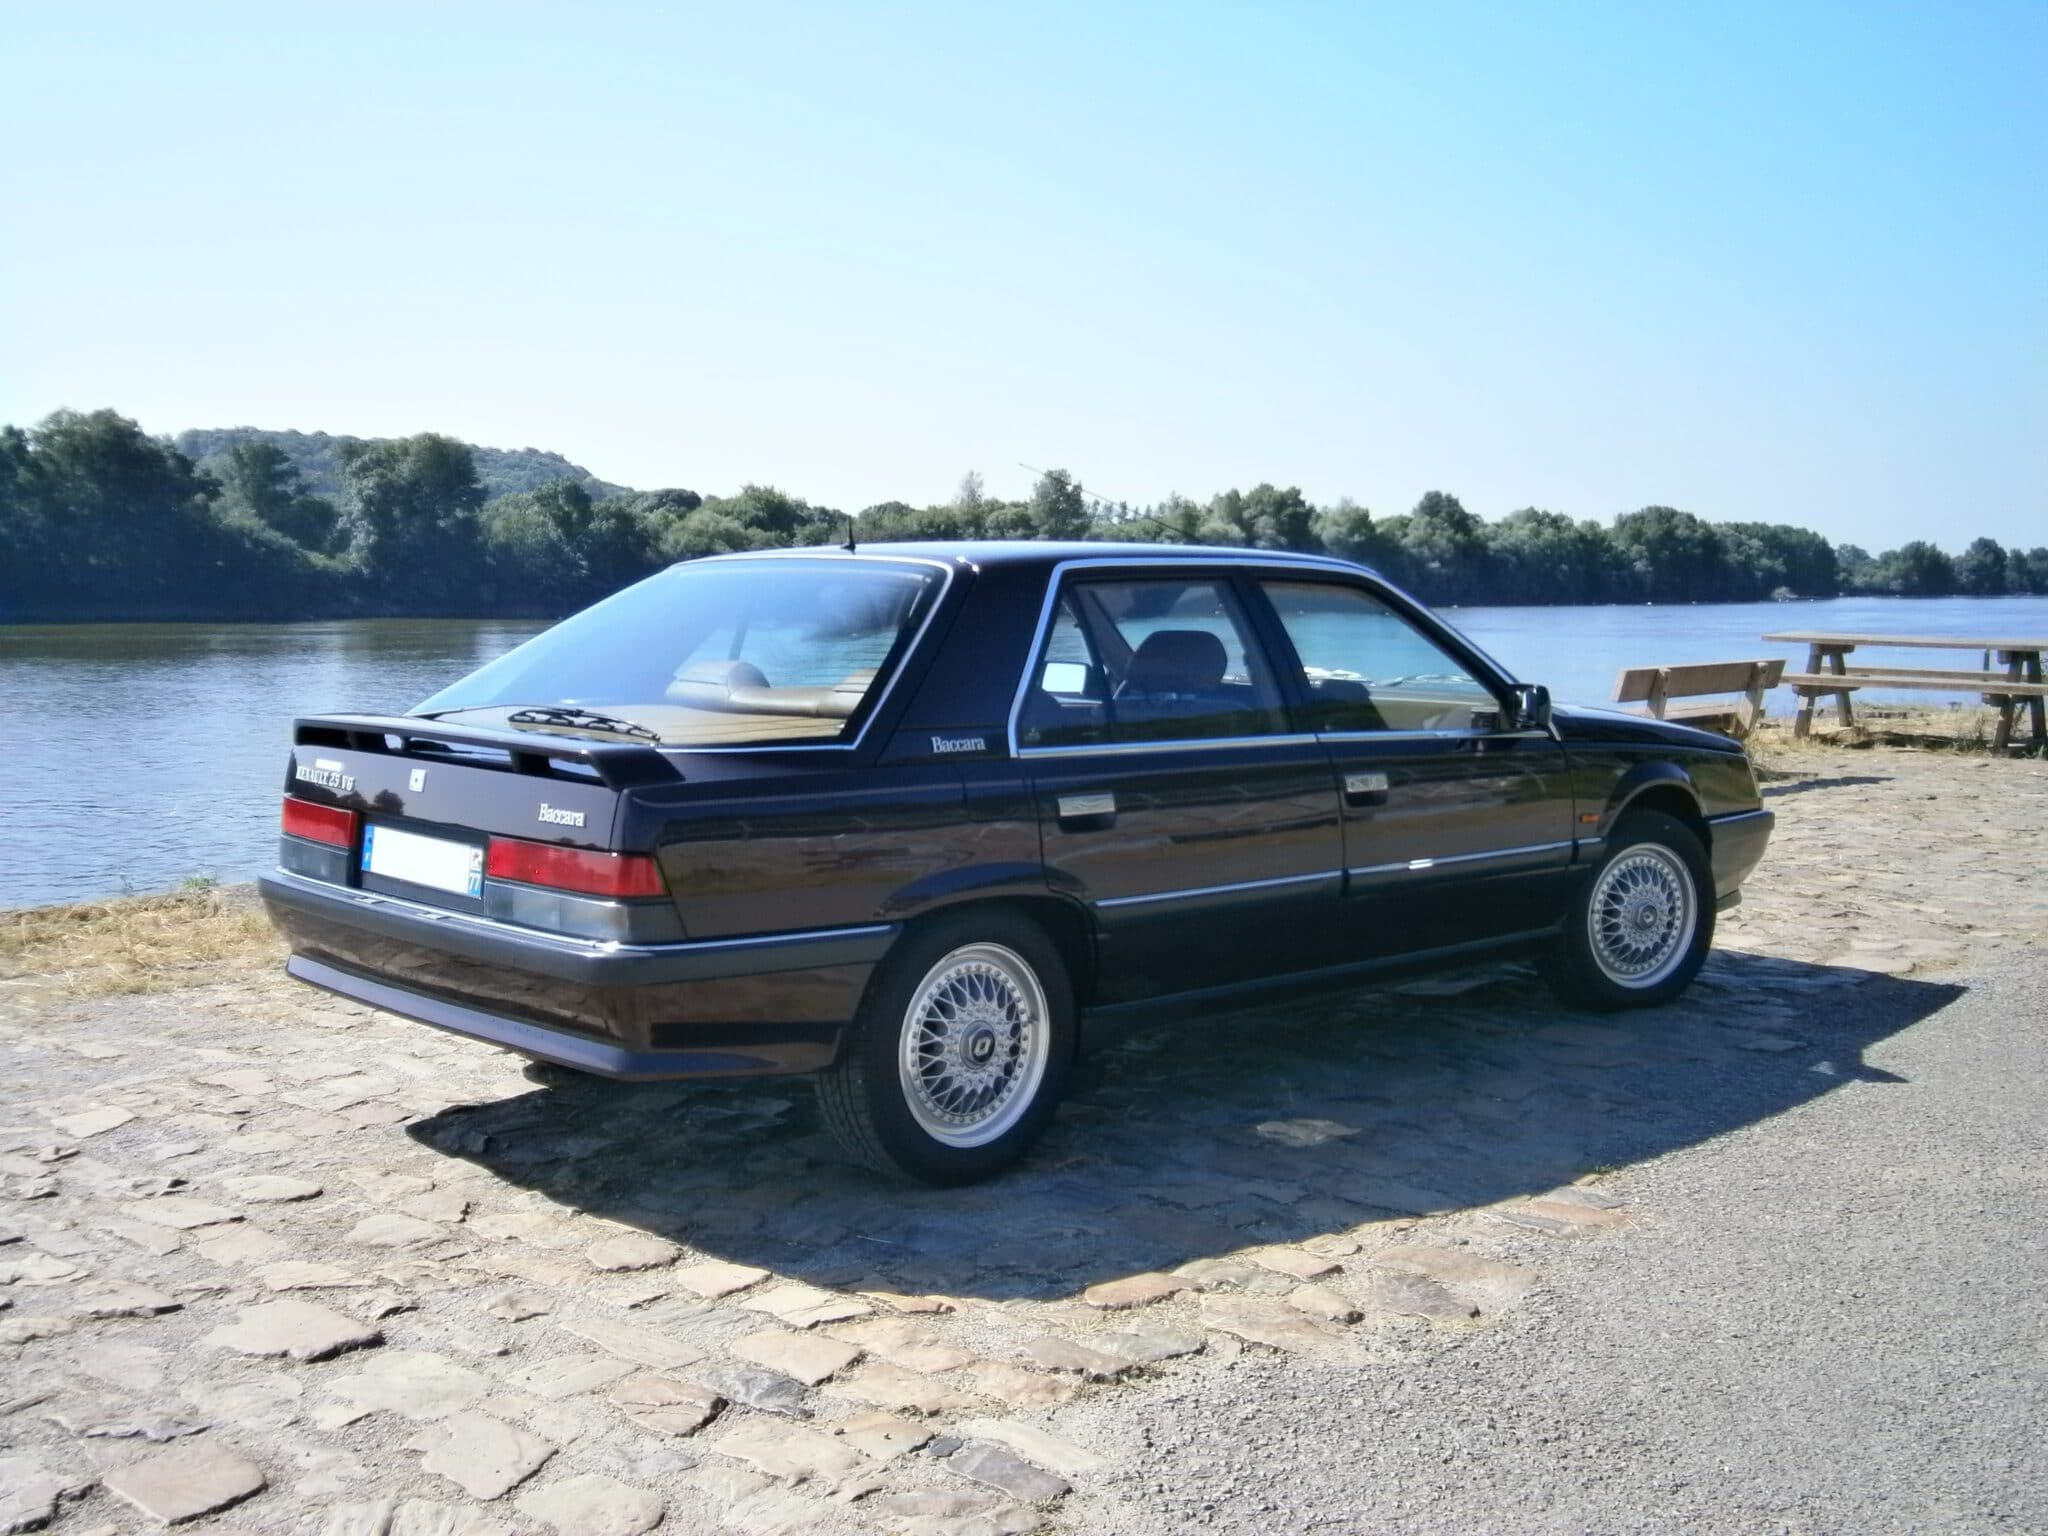 R25 Baccara 1990